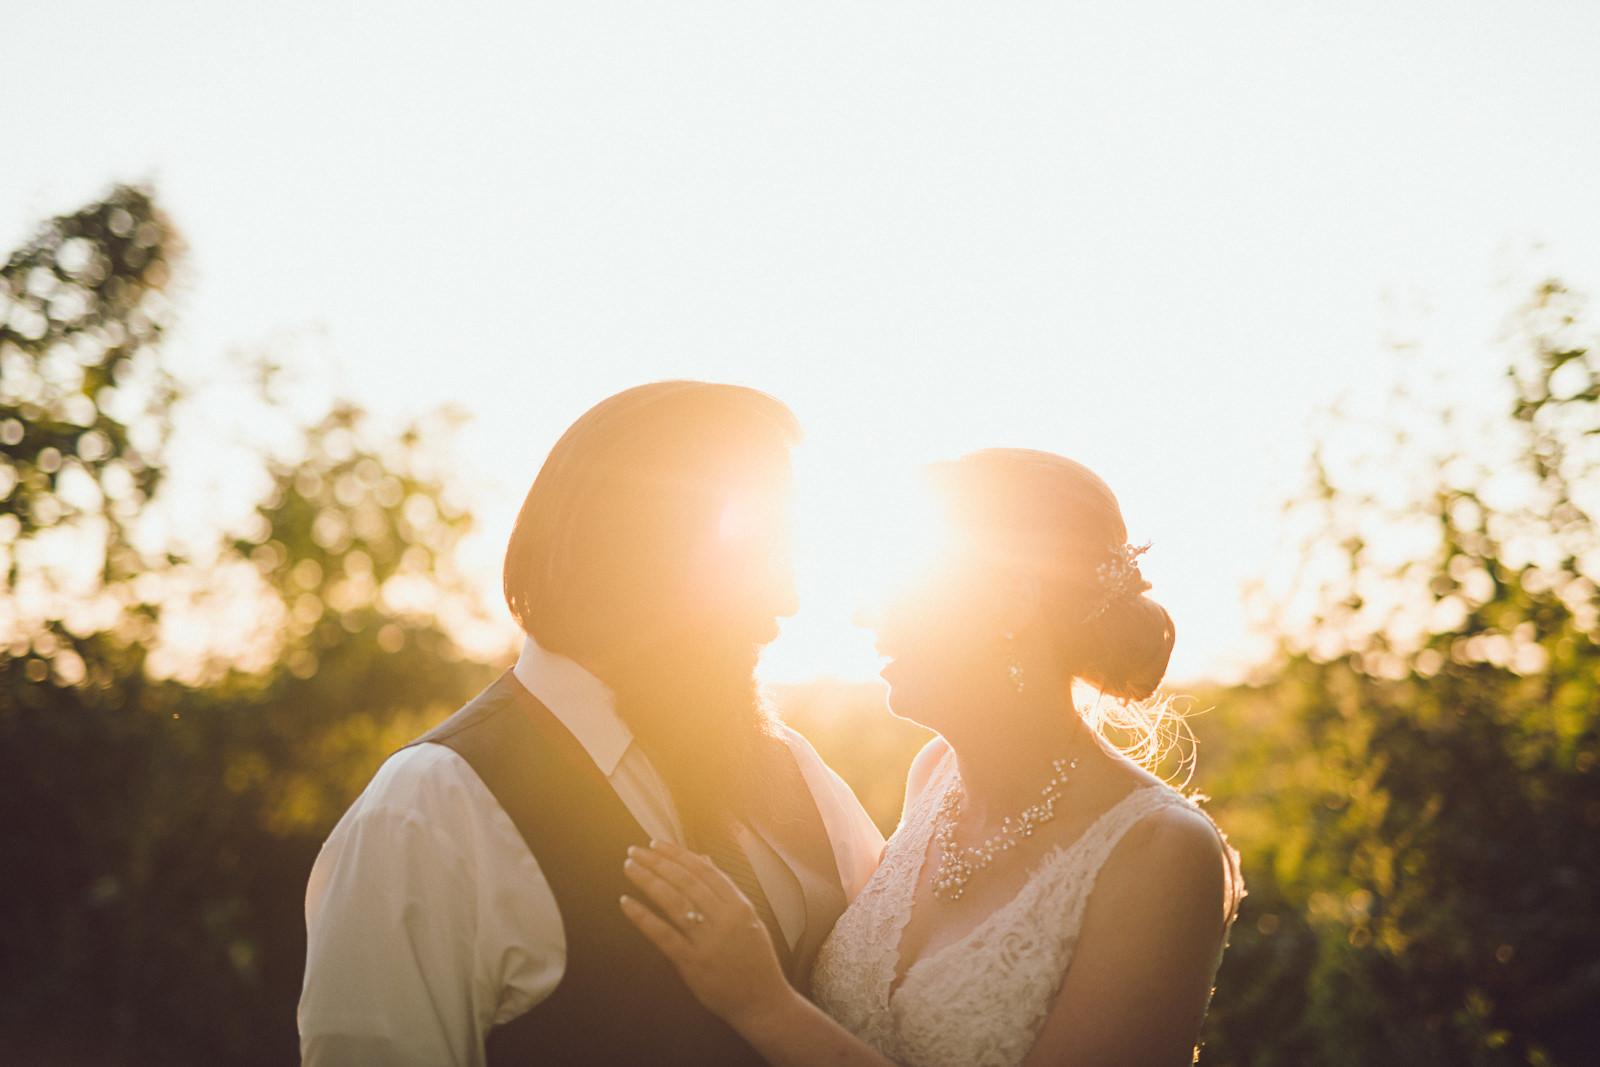 wedding-keely-caleb-1619-name-your-photo.jpg